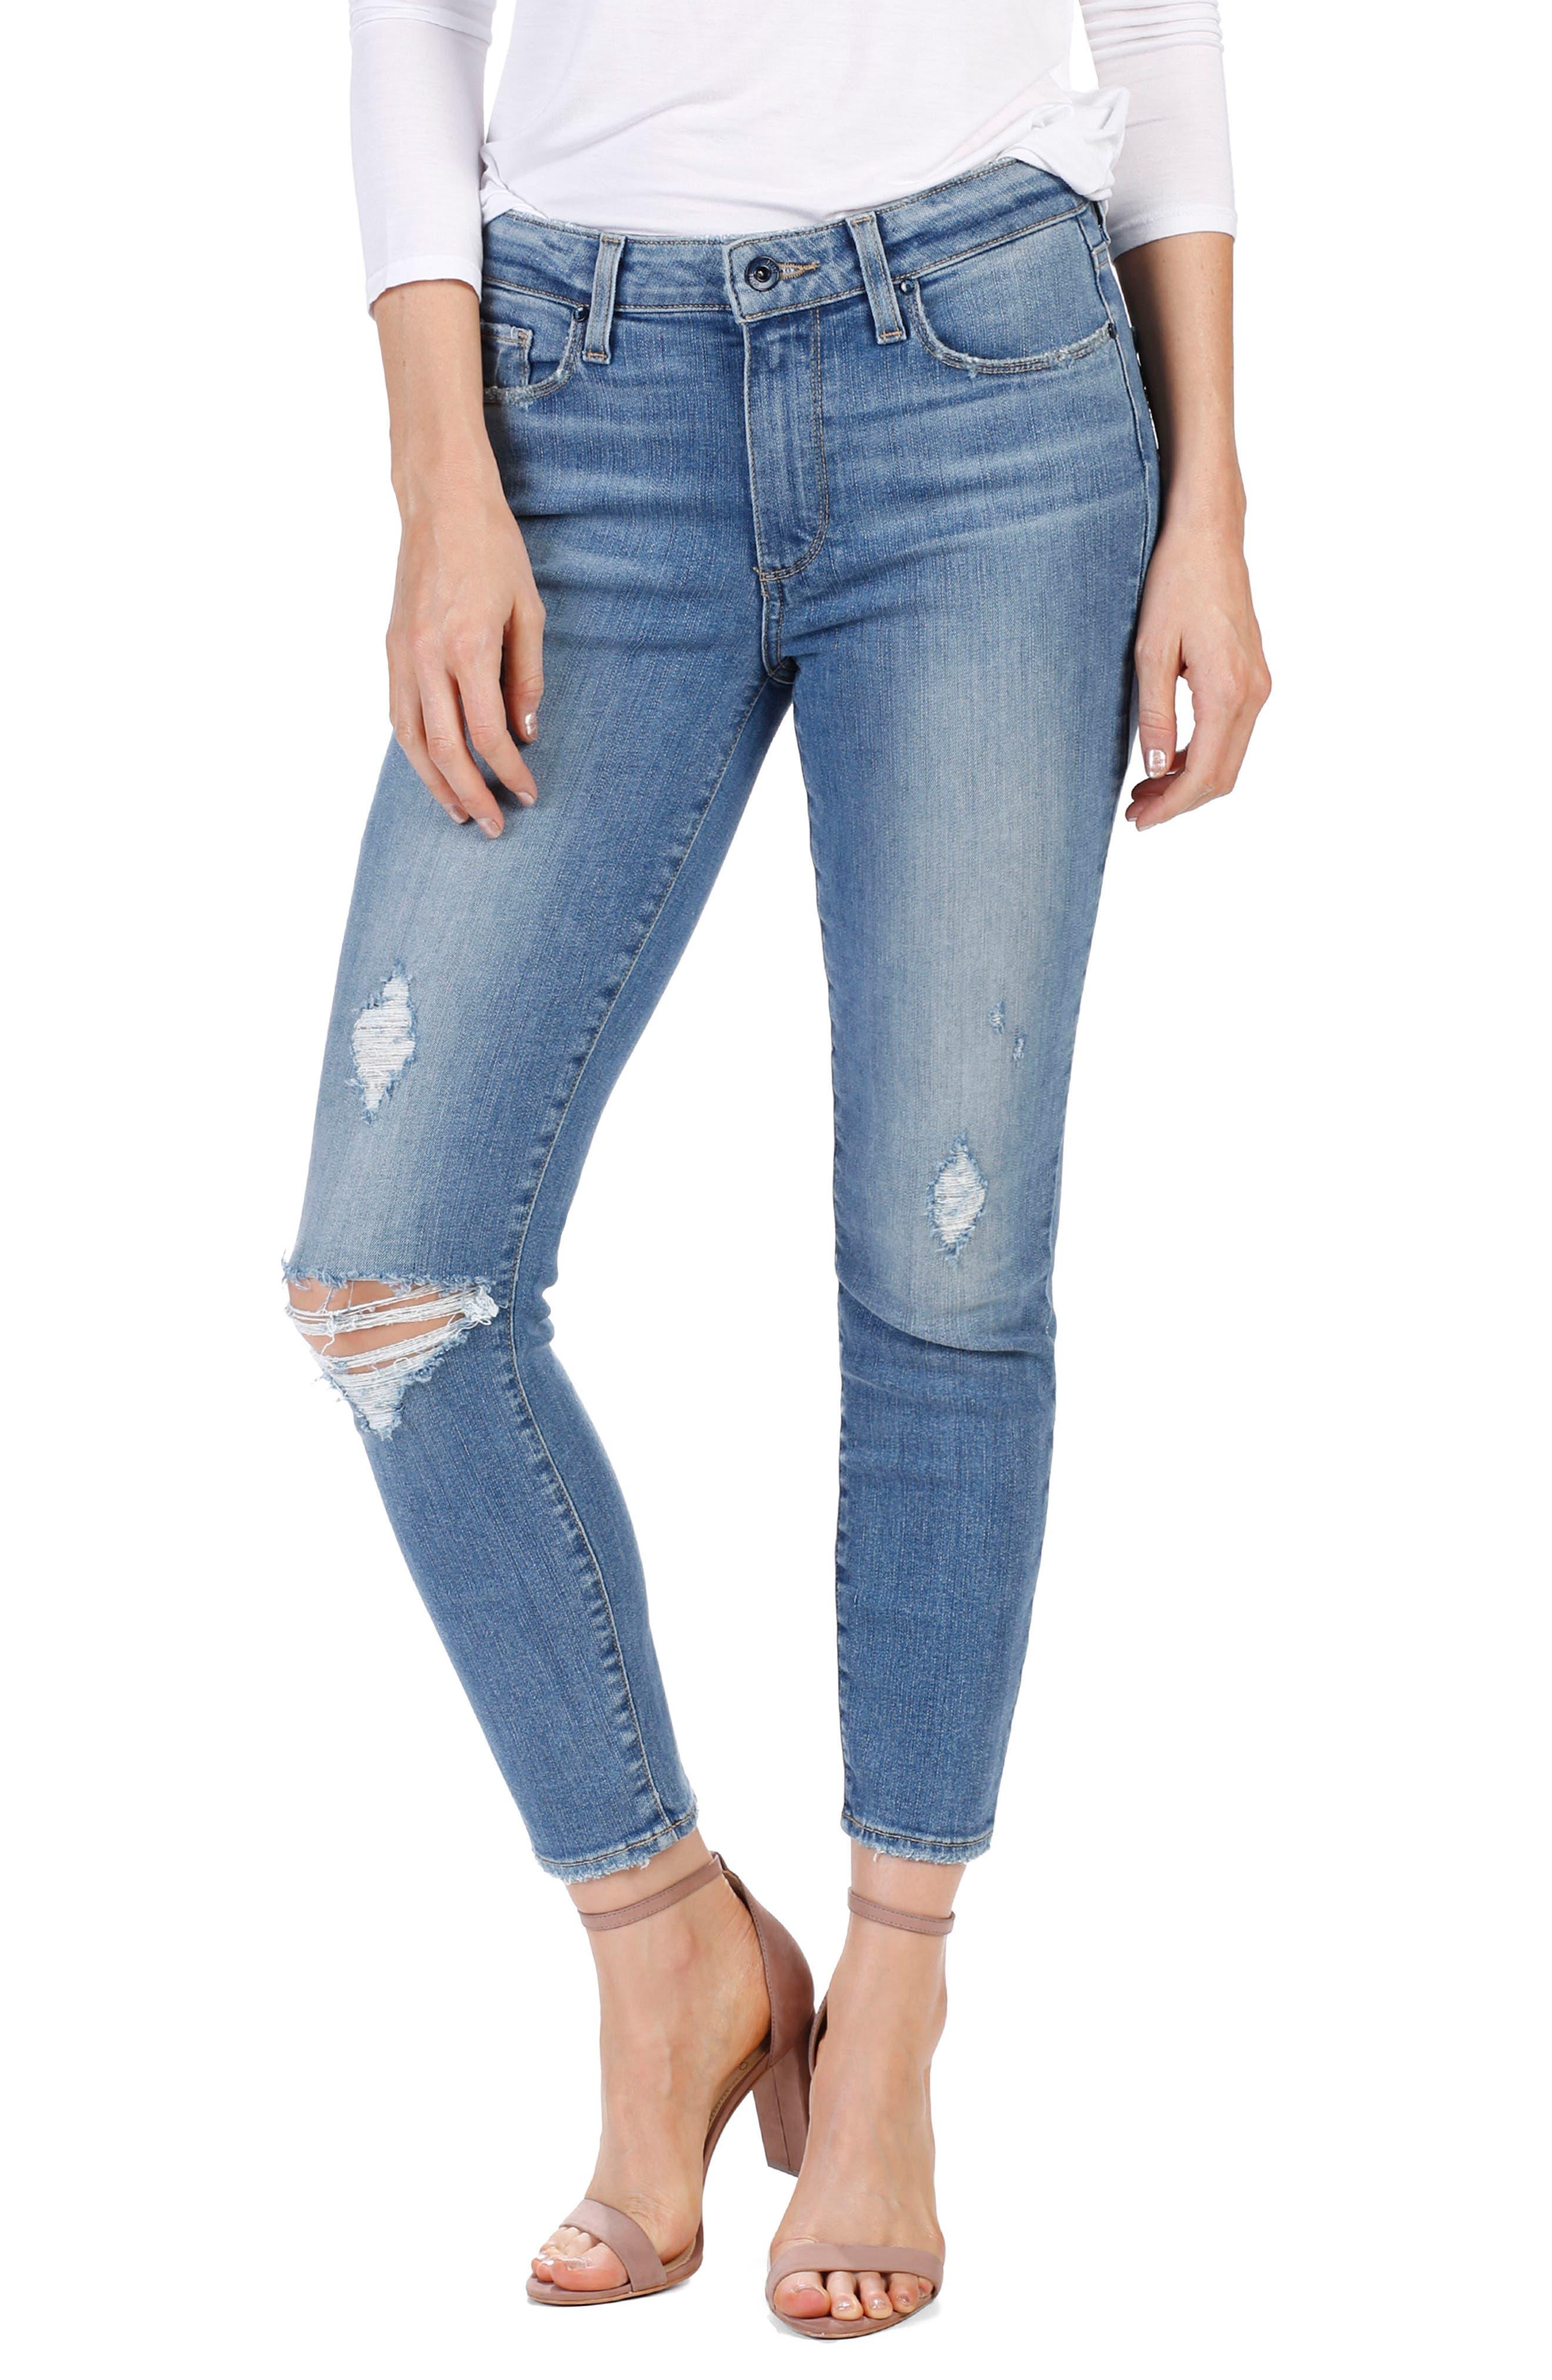 PAIGE Transcend Vintage - Hoxton High Waist Crop Jeans (Sienna Destructed)